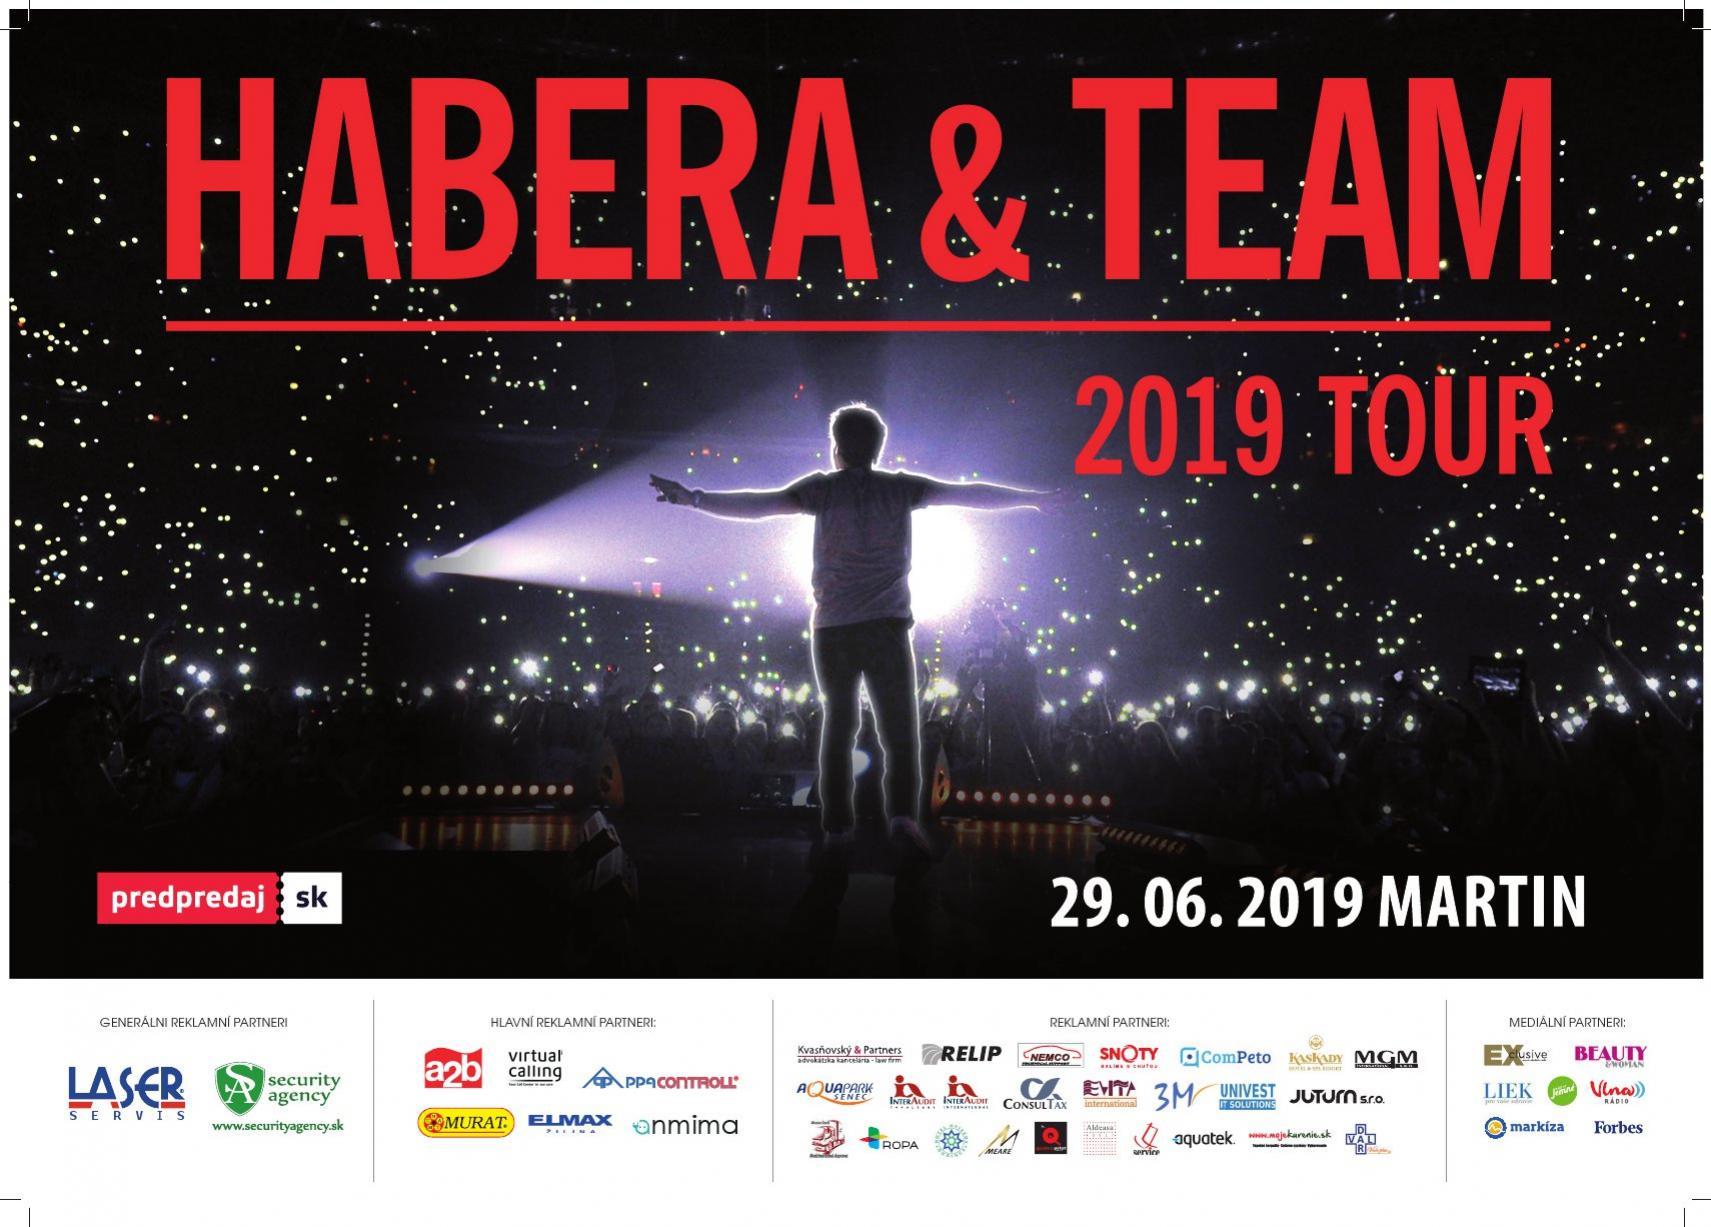 Habera a Team Tour 2019 Martin Ružomberok Dolný Kubín